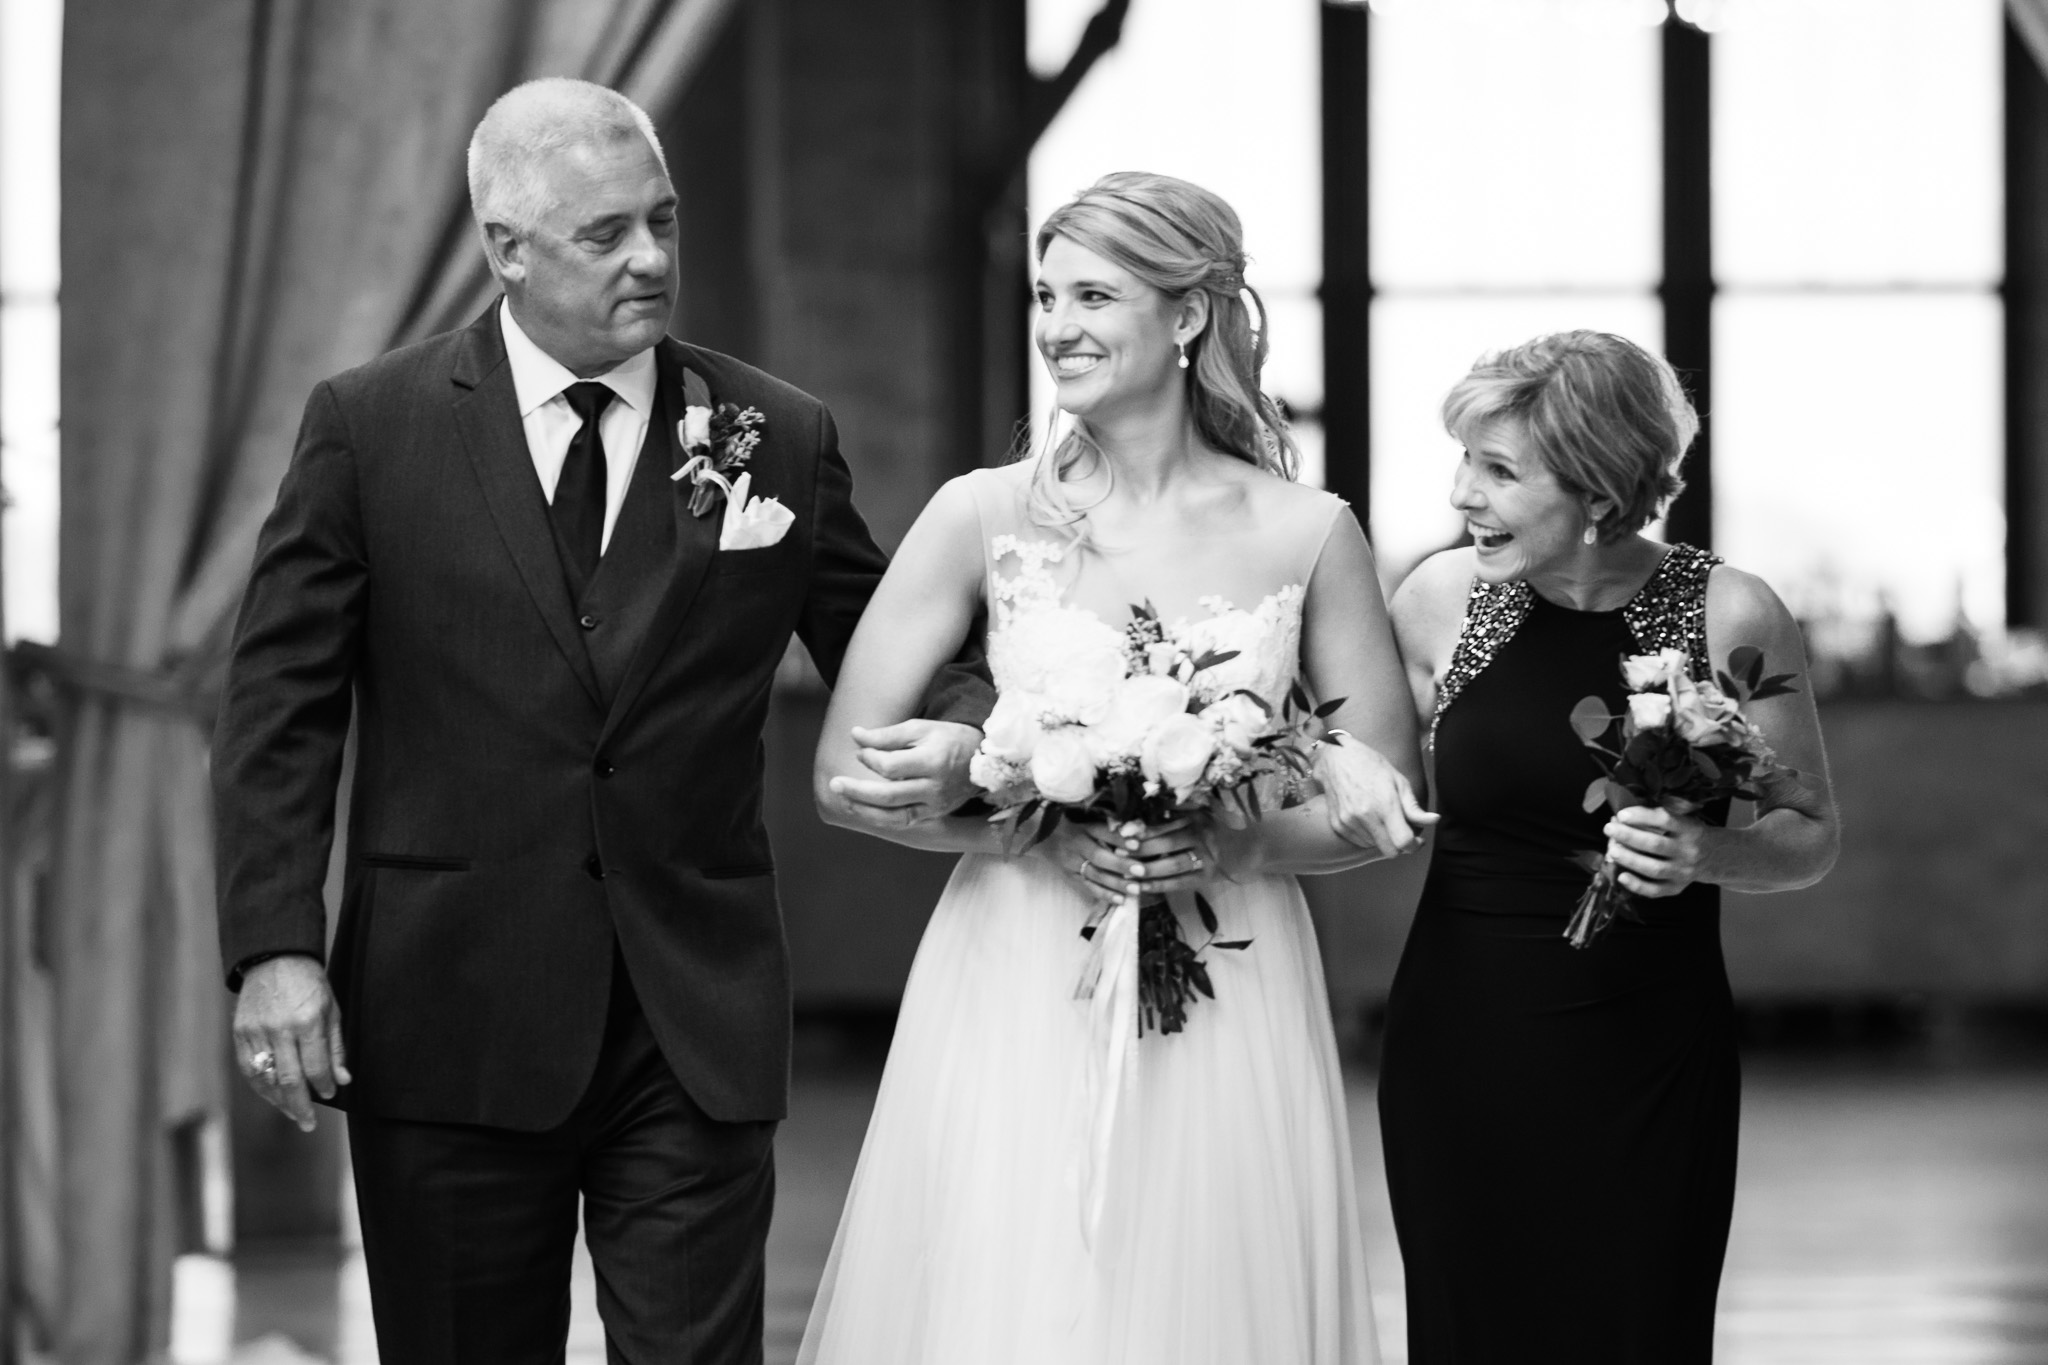 bridgeport-art-center-wedding-photos-21.jpg